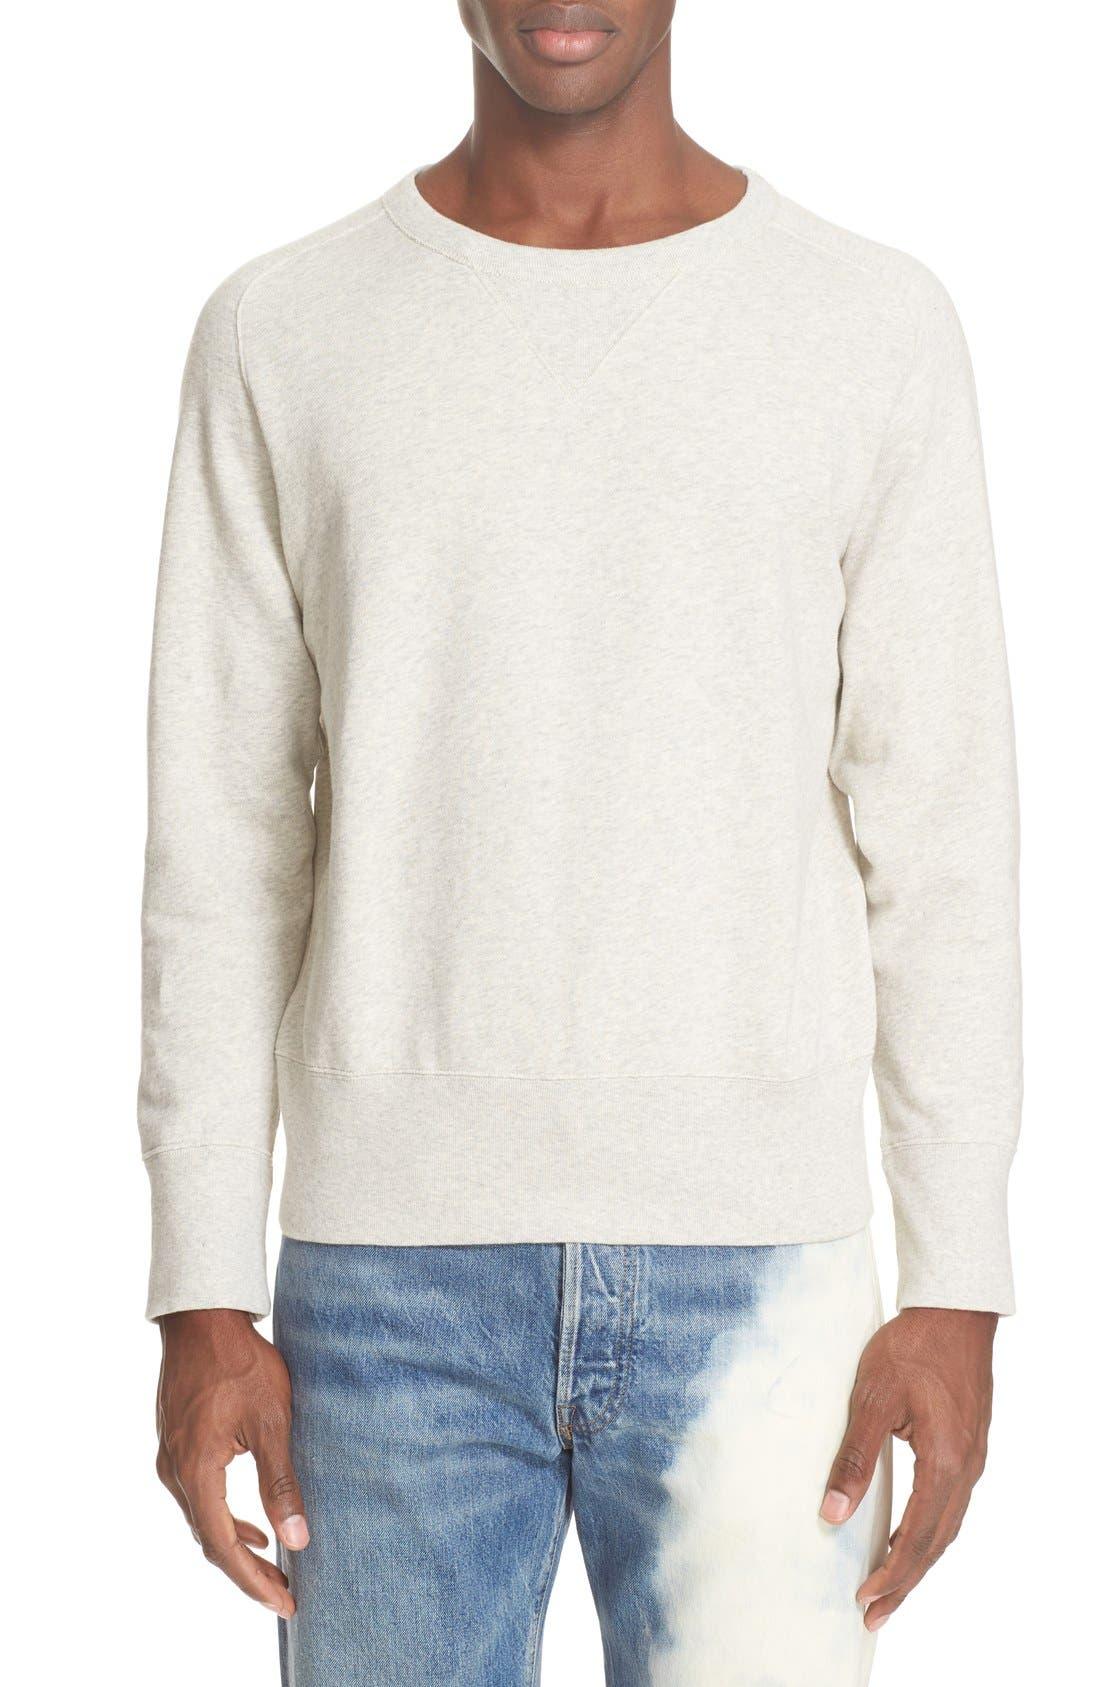 Bay Meadows Sweatshirt,                             Main thumbnail 1, color,                             White